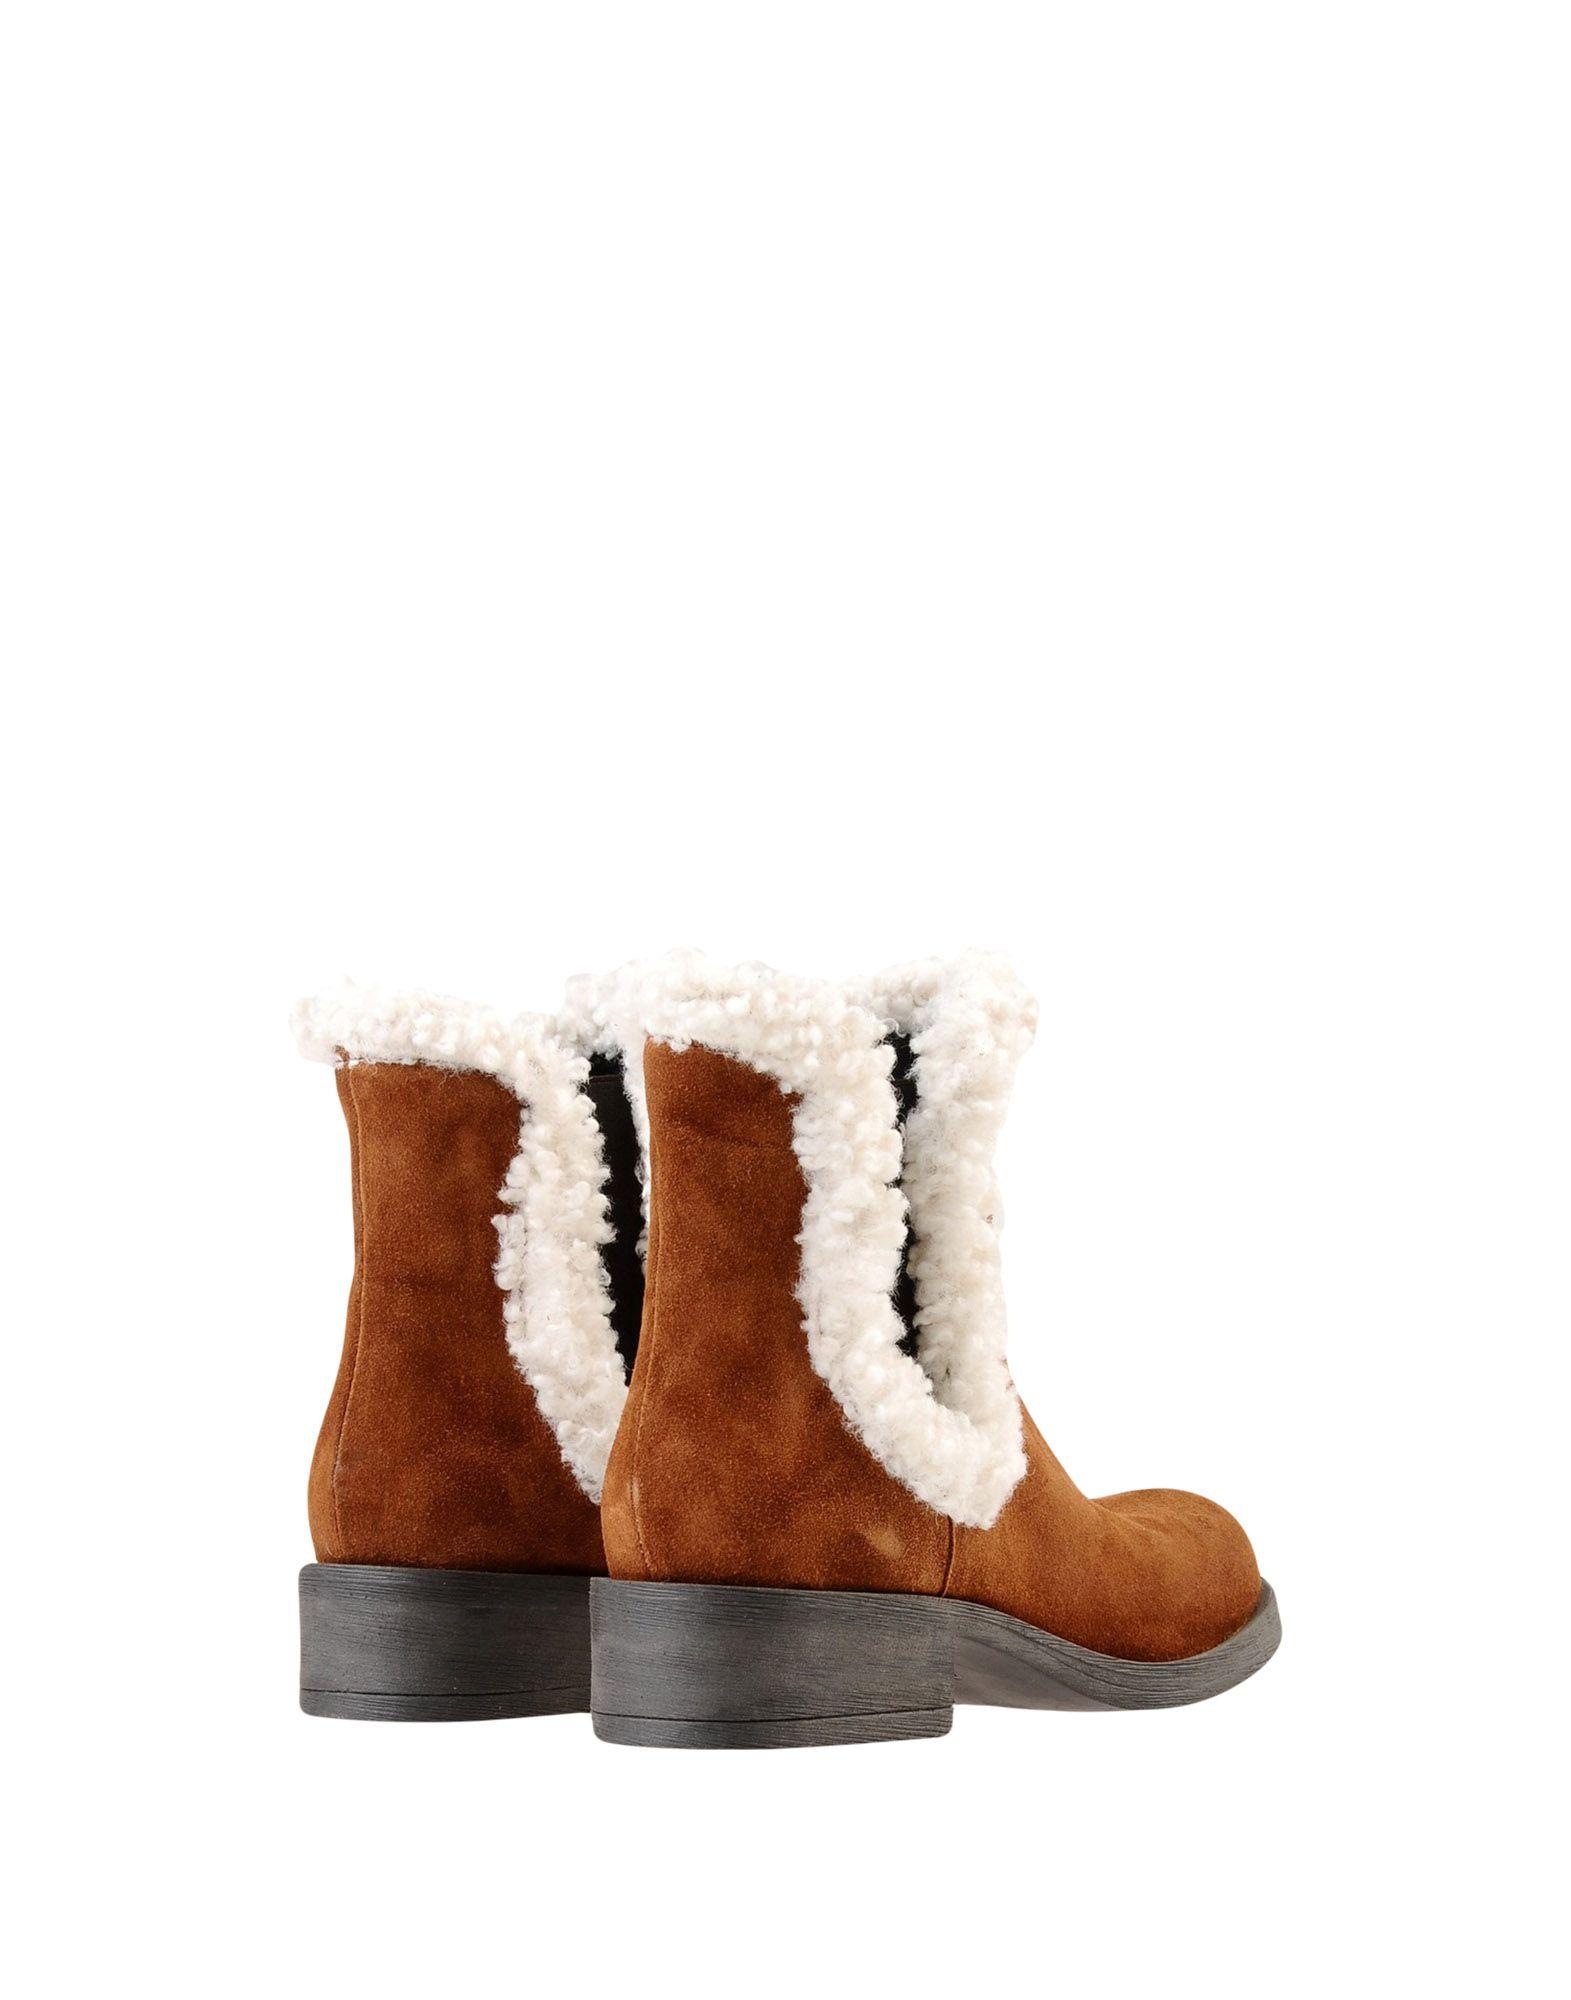 George J. Qualität Love Stiefelette Damen  11538193SH Gute Qualität J. beliebte Schuhe 57a31e